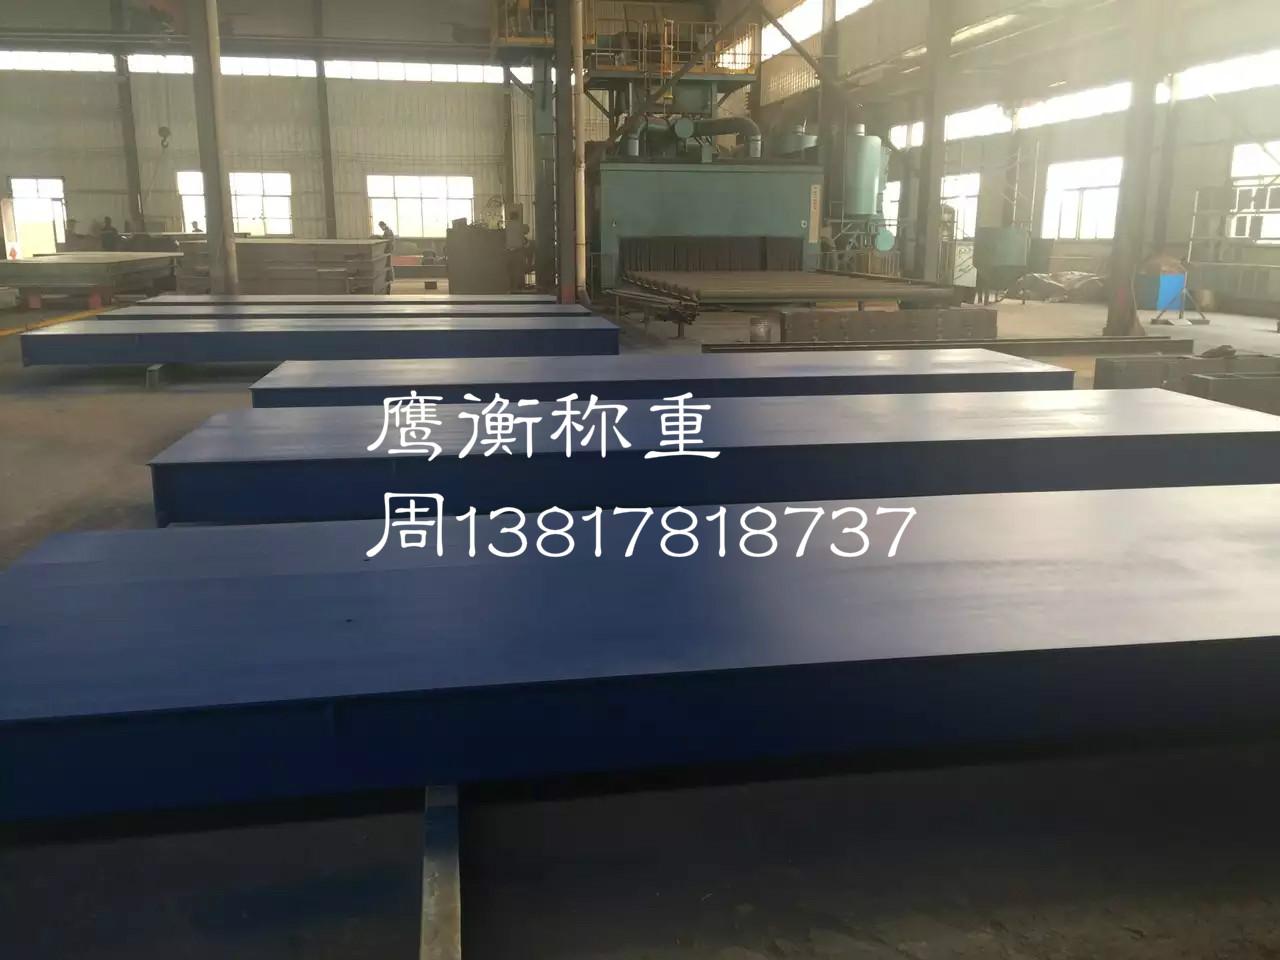 scs-青浦区地磅(80吨,100吨)厂家报价?